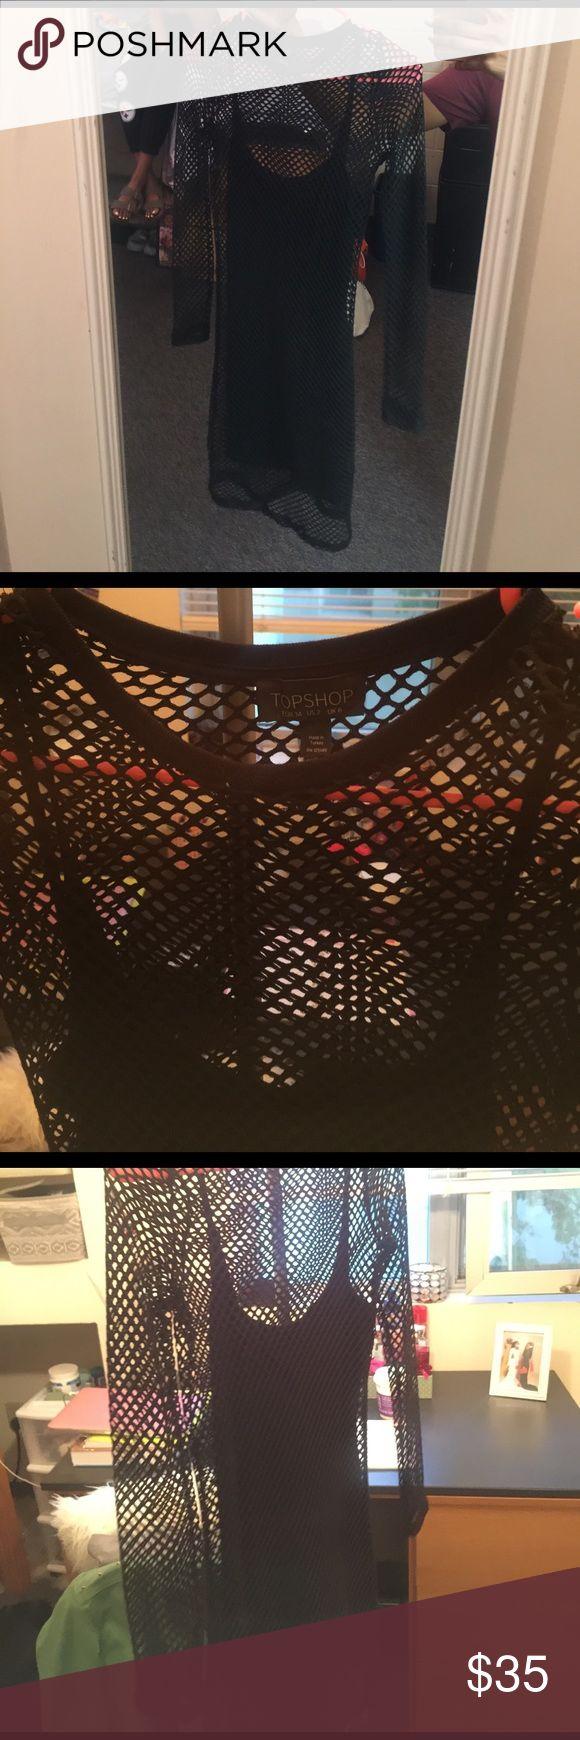 Fishnet dress Fishnet dress with solid black slip under.. mini dress.. fits like a size small worn once Topshop Dresses Mini